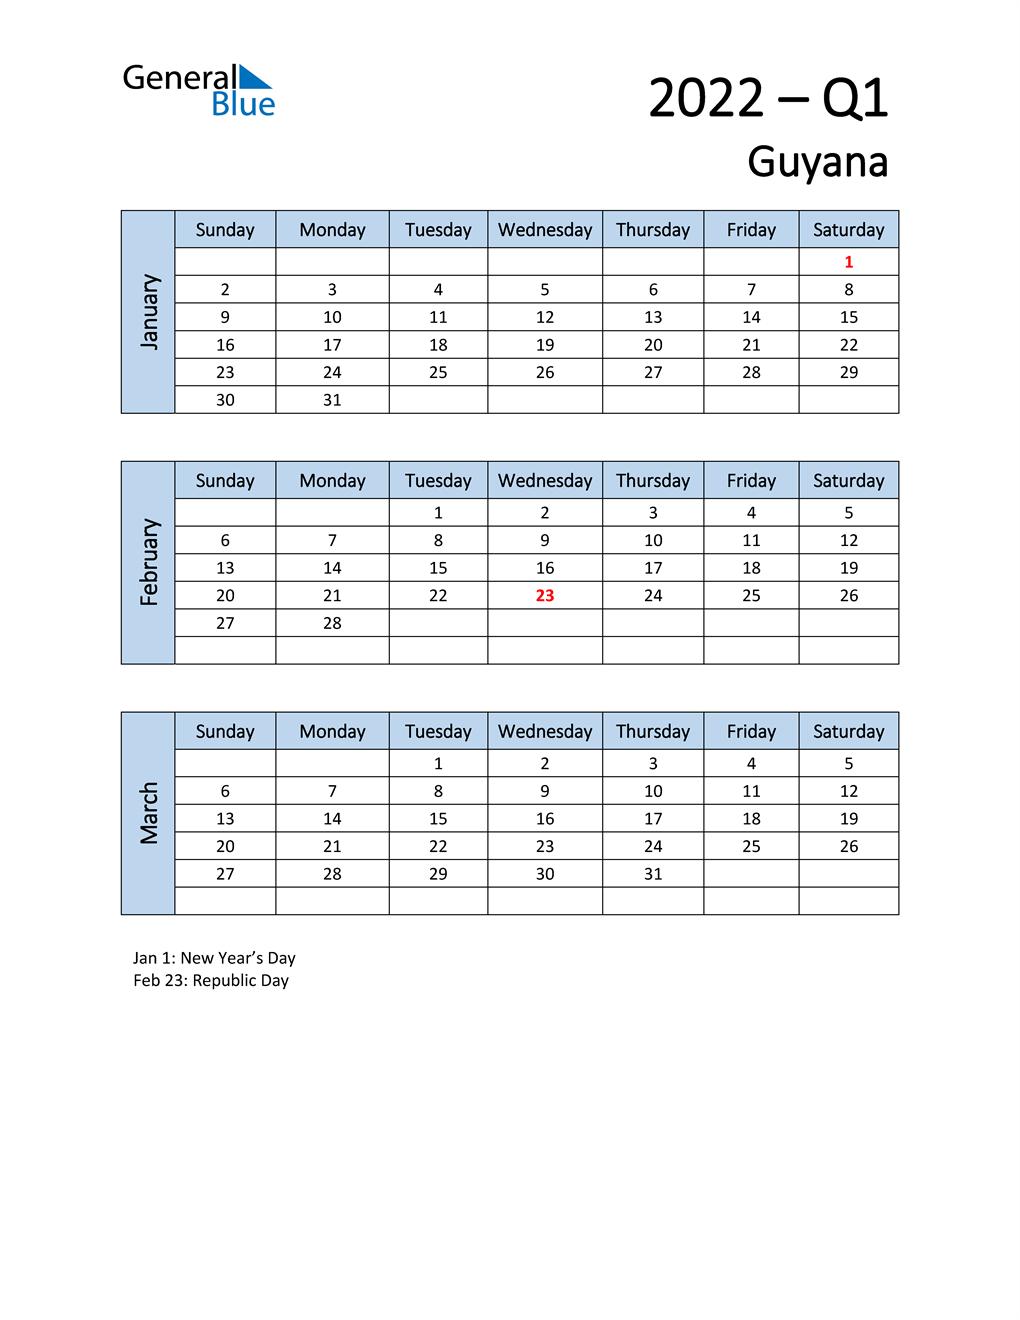 Free Q1 2022 Calendar for Guyana